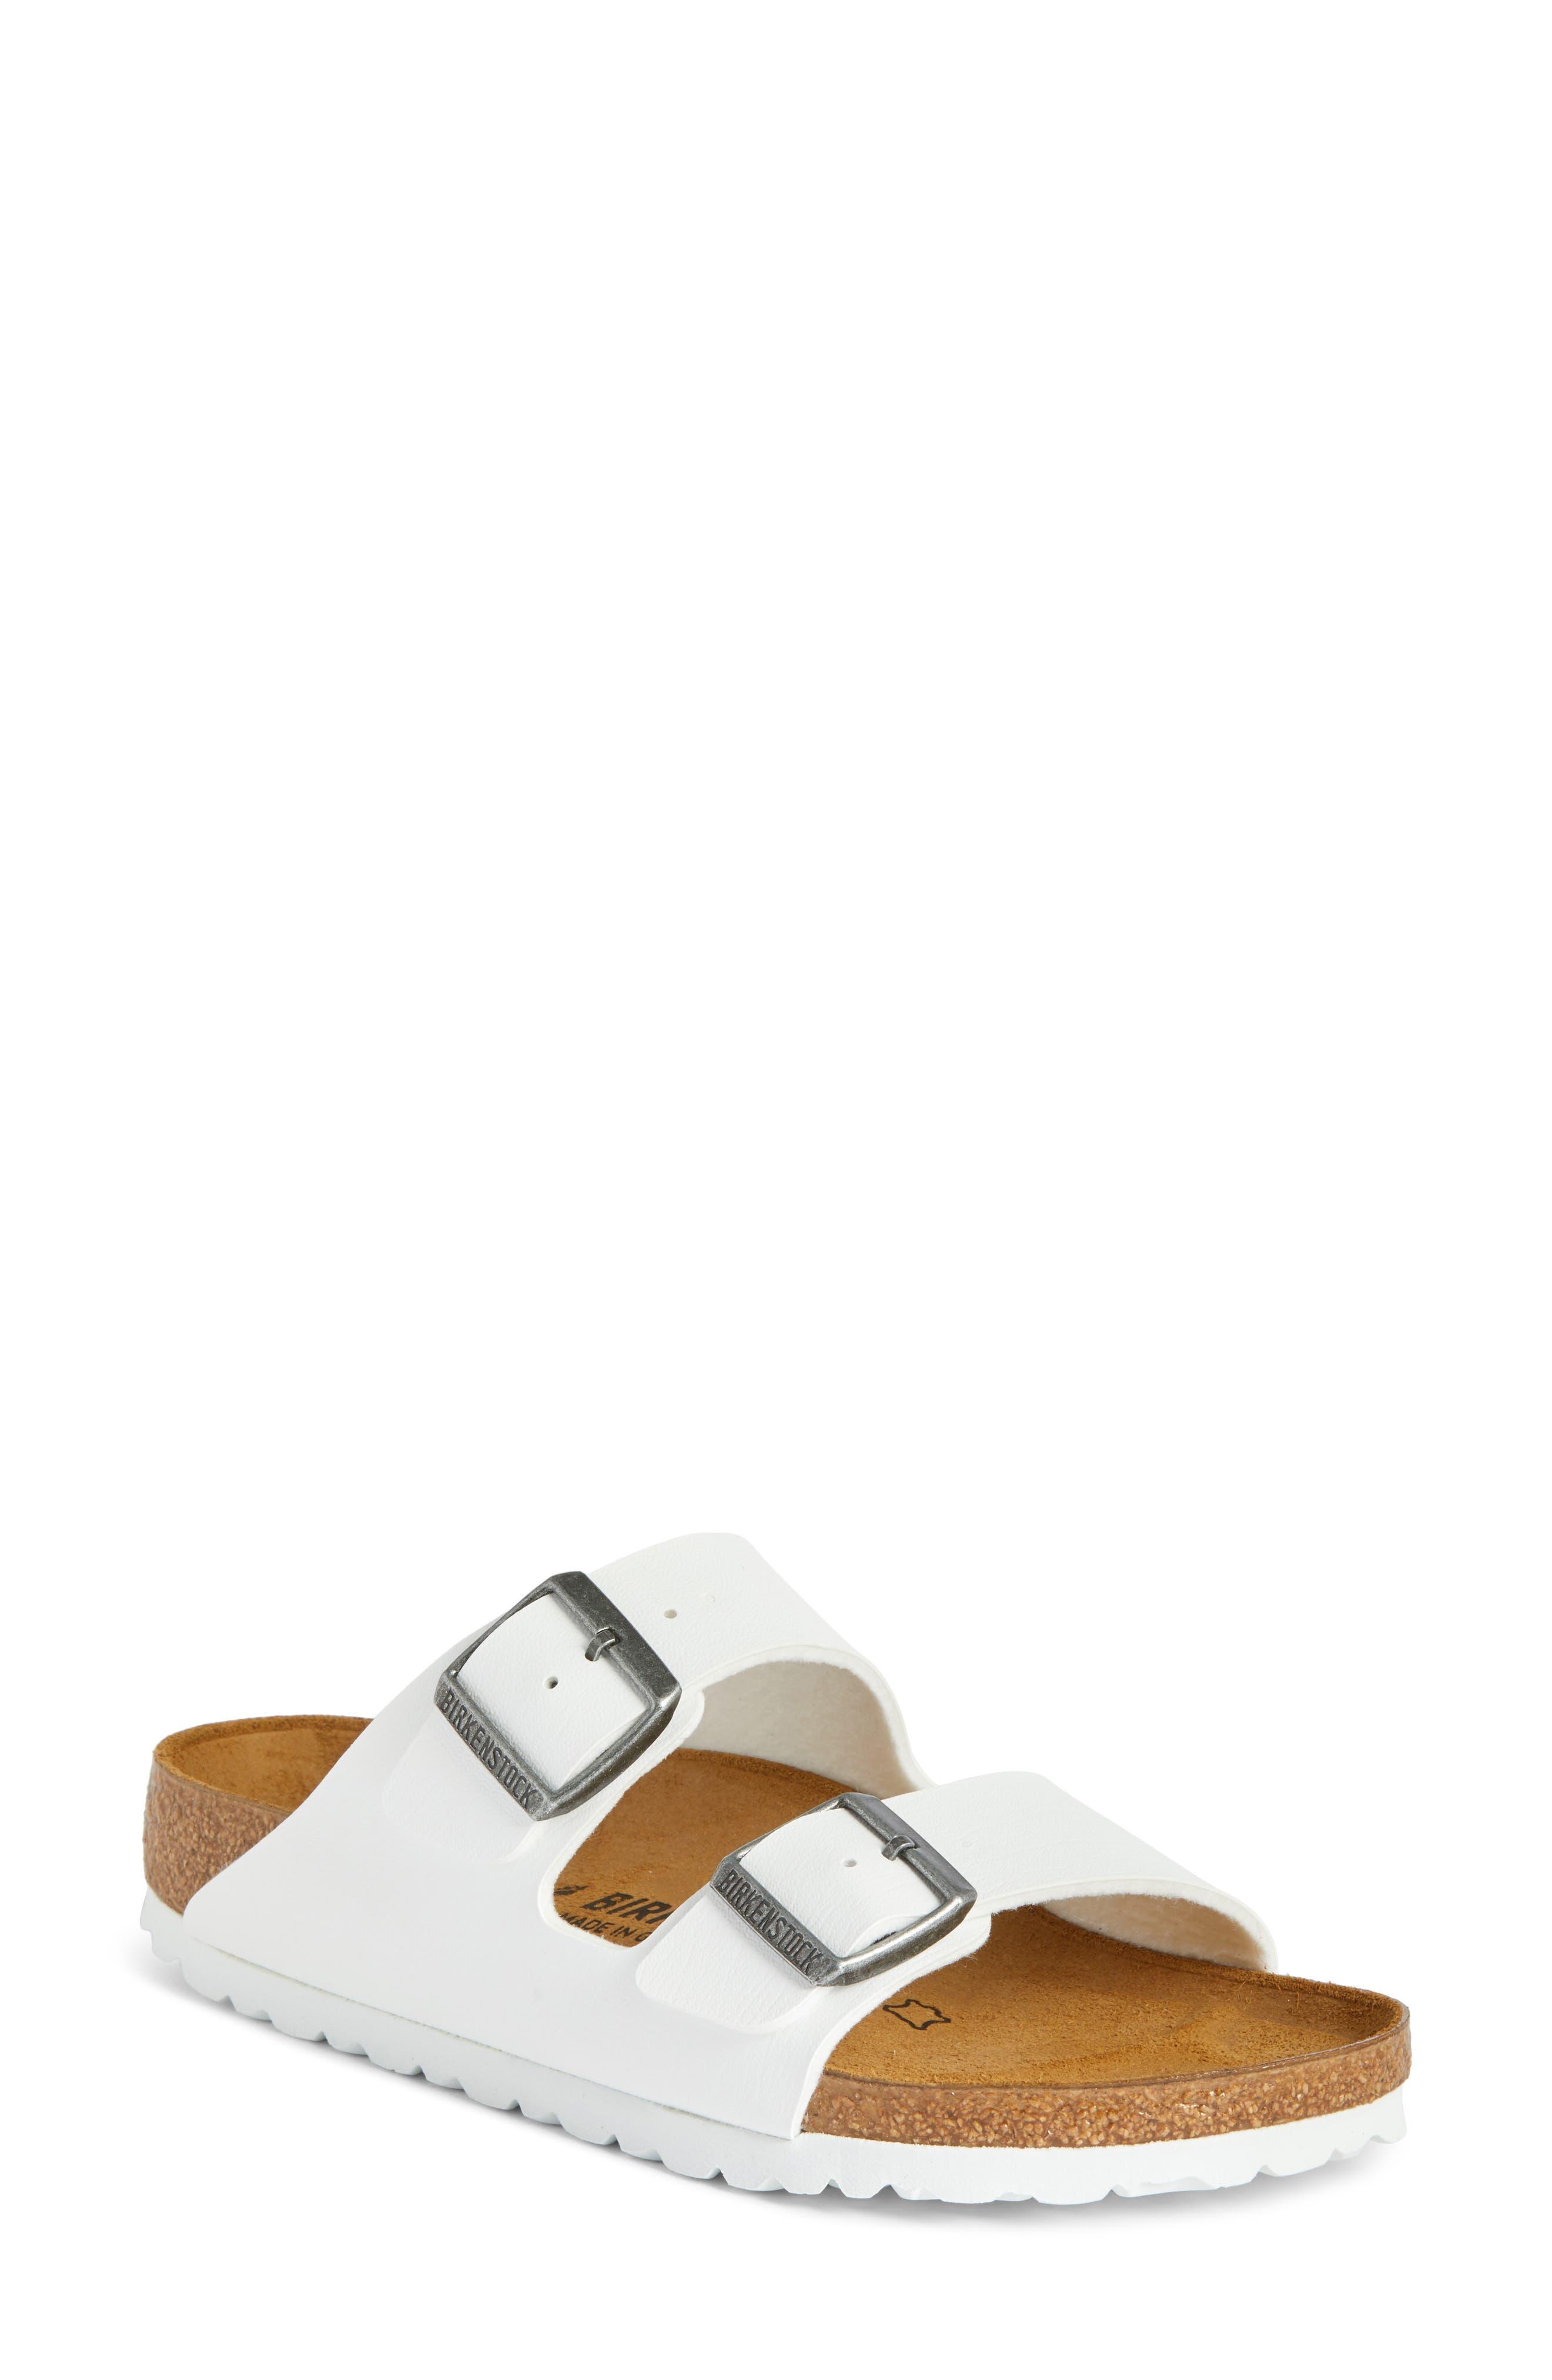 ,                             'Arizona' White Birko-Flor Sandal,                             Main thumbnail 1, color,                             WHITE SYNTHETIC LEATHER